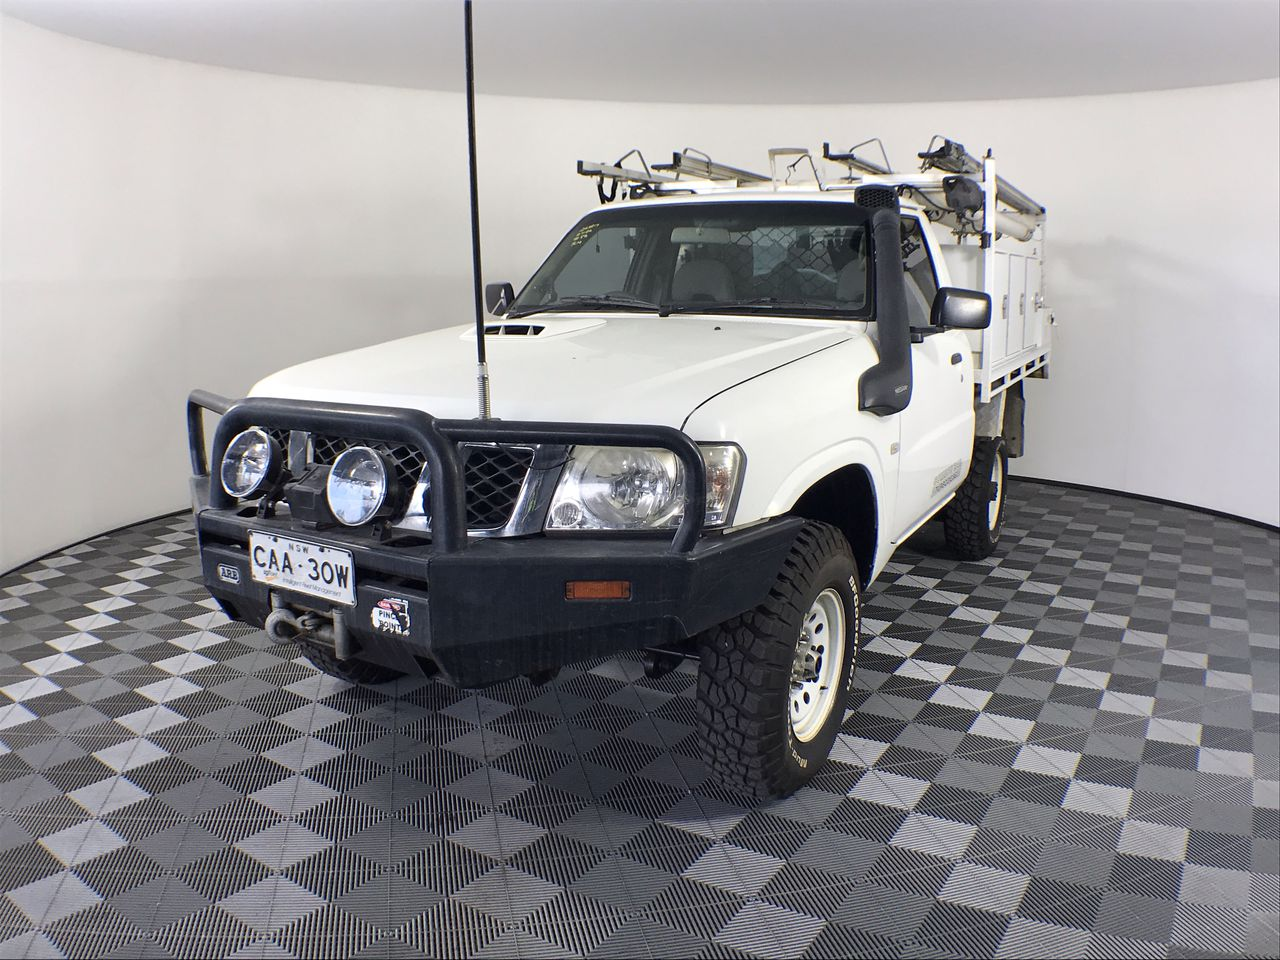 2011 (COMP) Nissan Patrol DX (4x4) GU Turbo Diesel Manual Cab Chassis